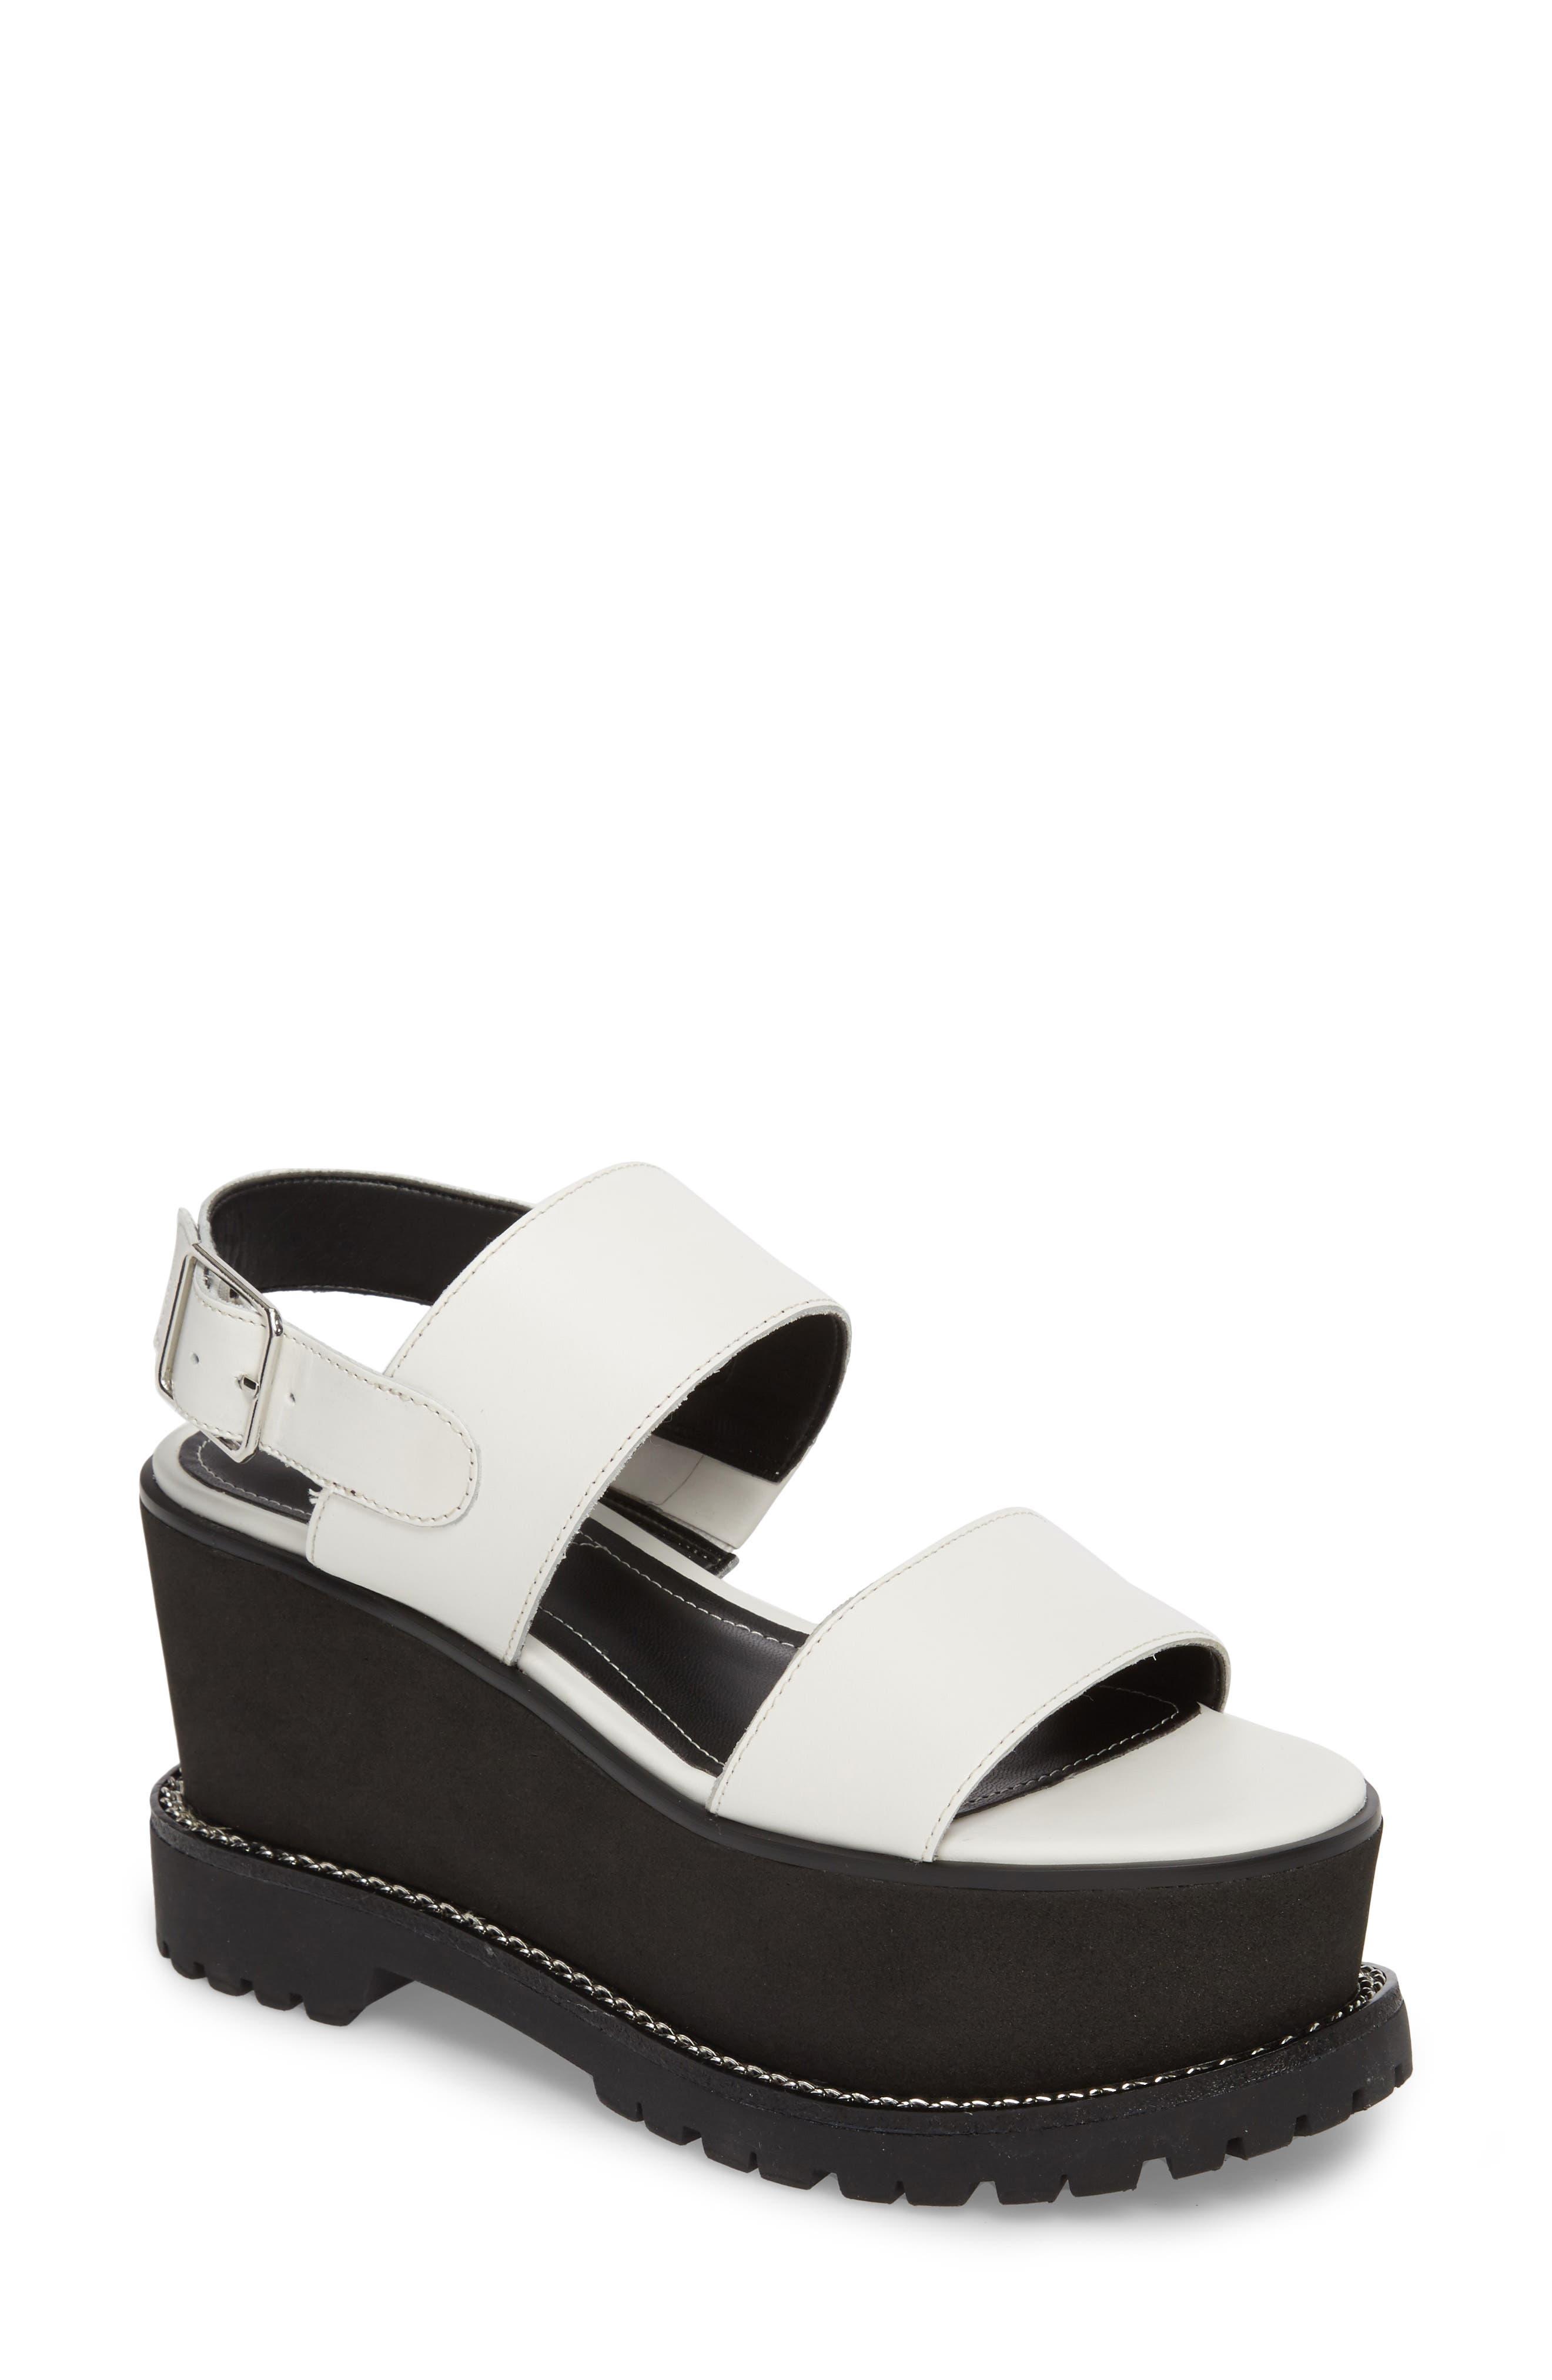 KENDALL + KYLIE Cady Platform Sandal (Women)